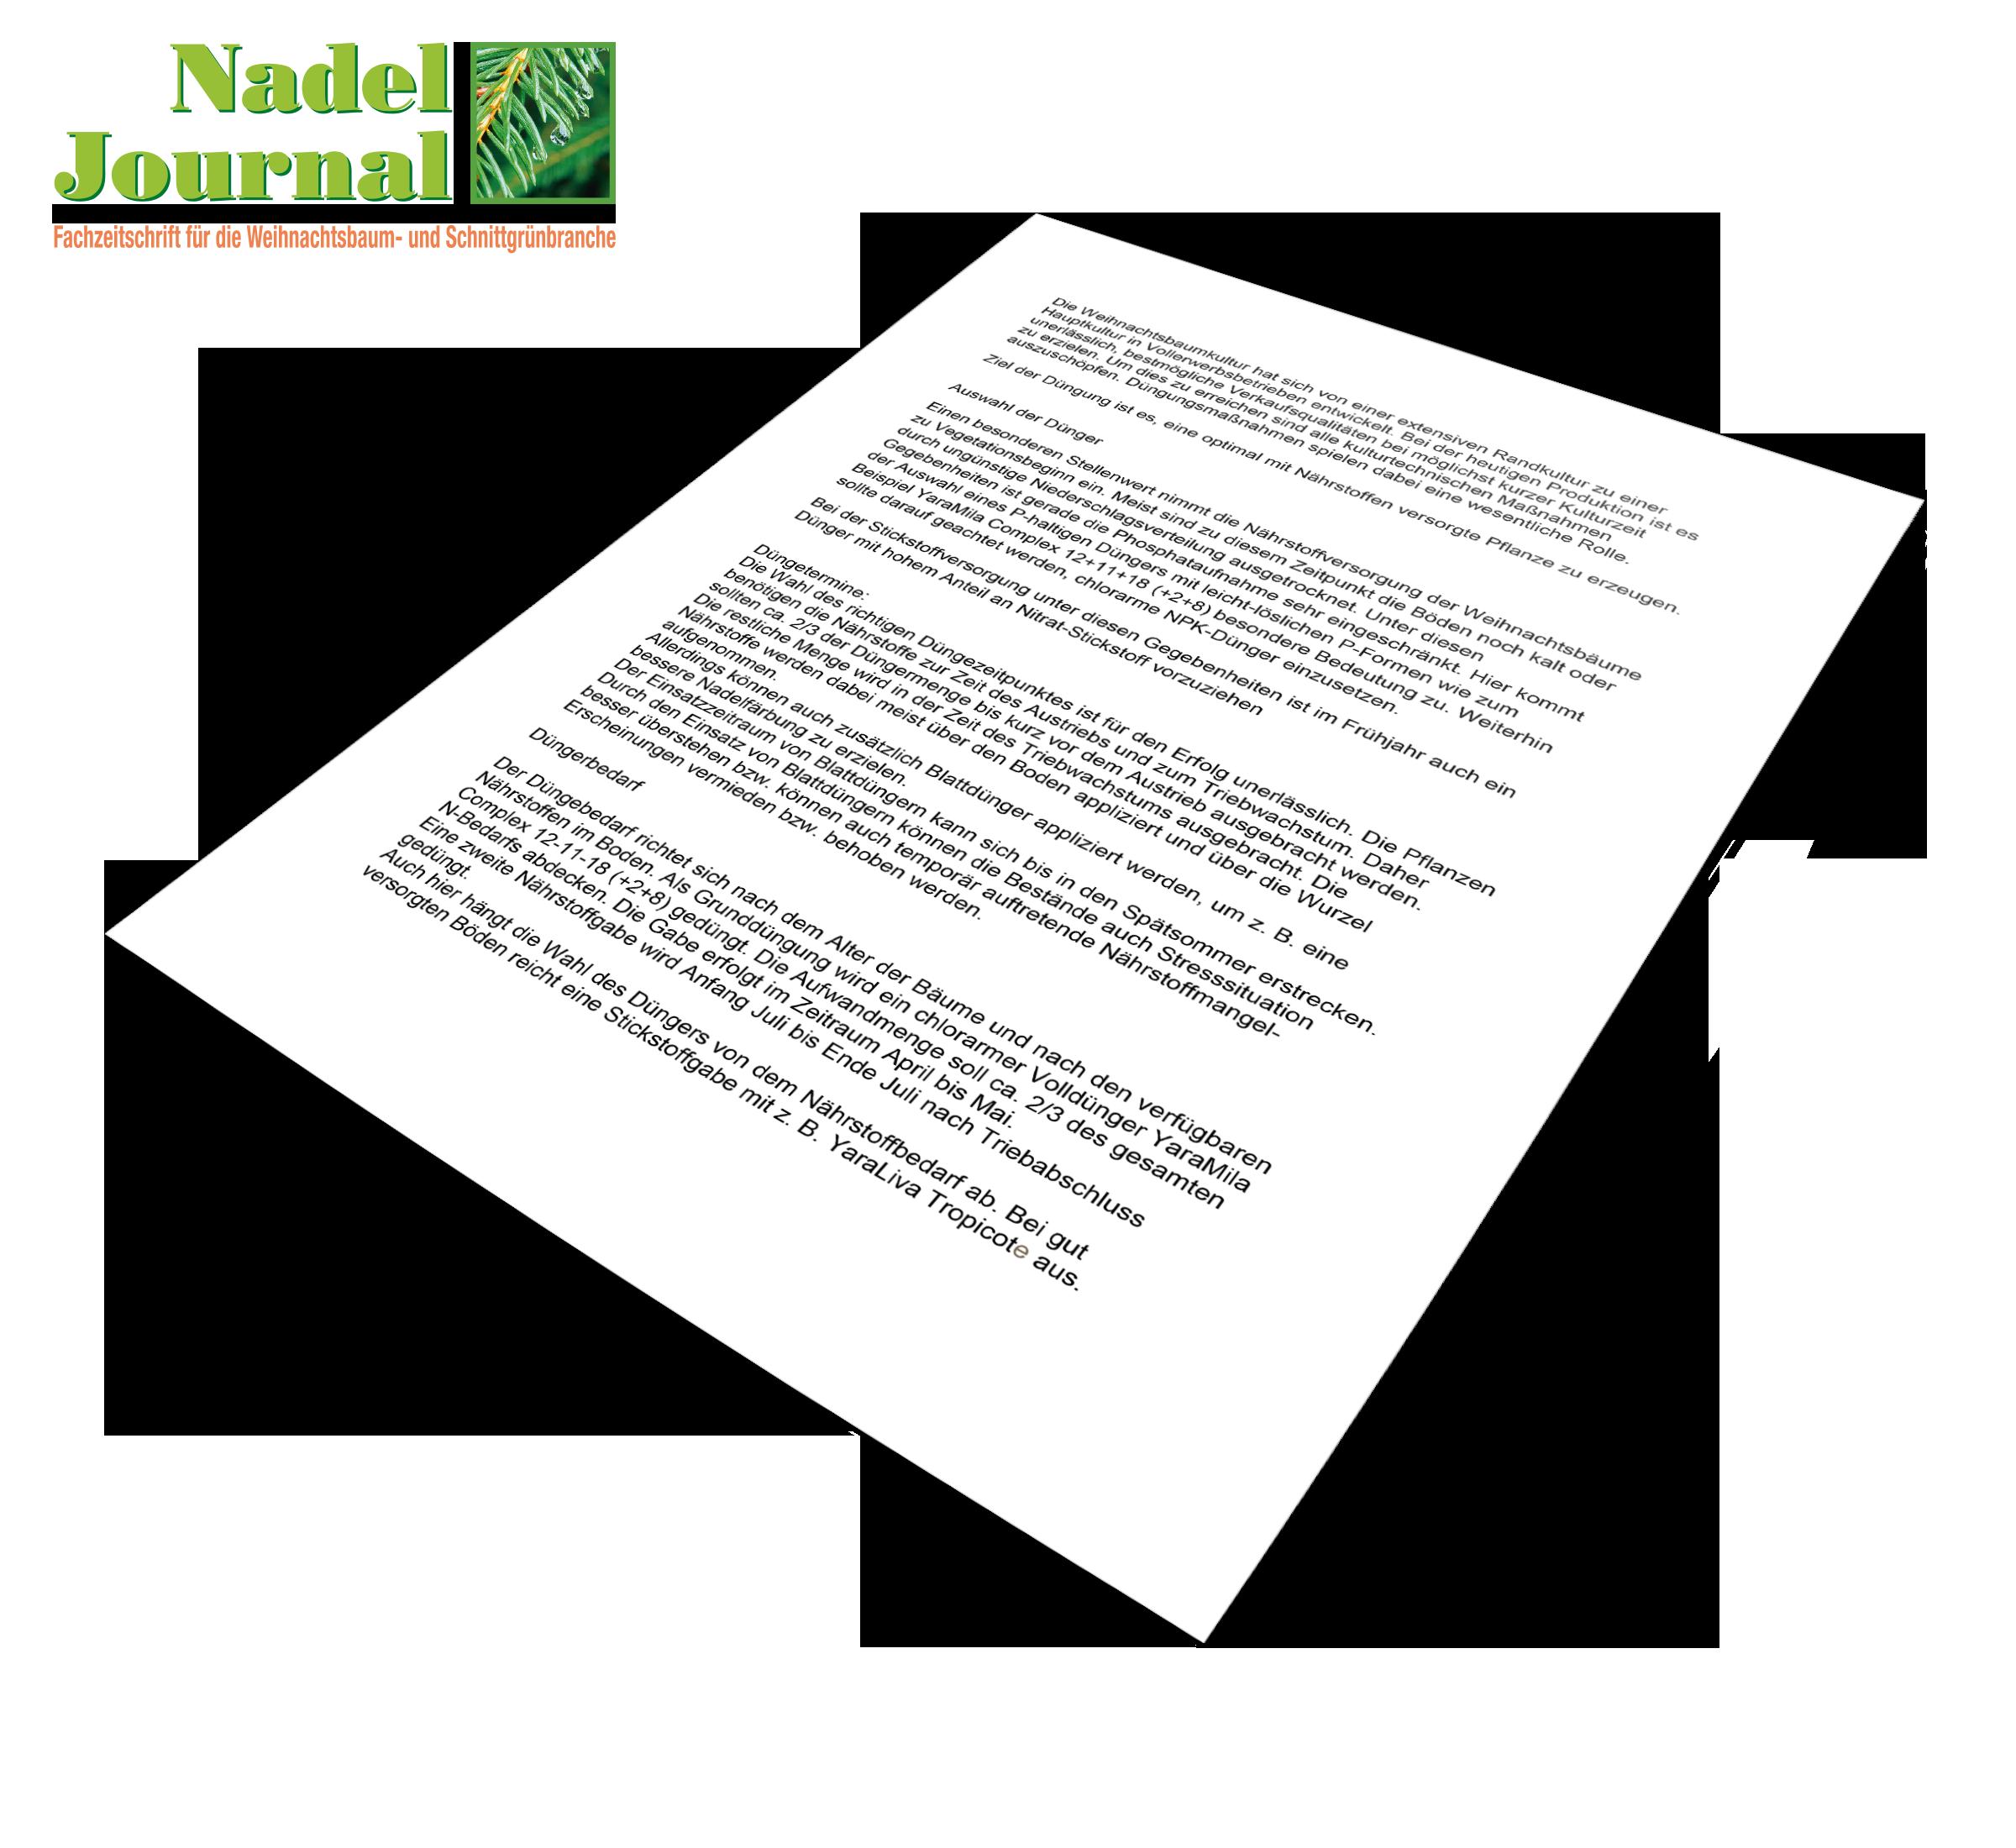 Nadeljournal02